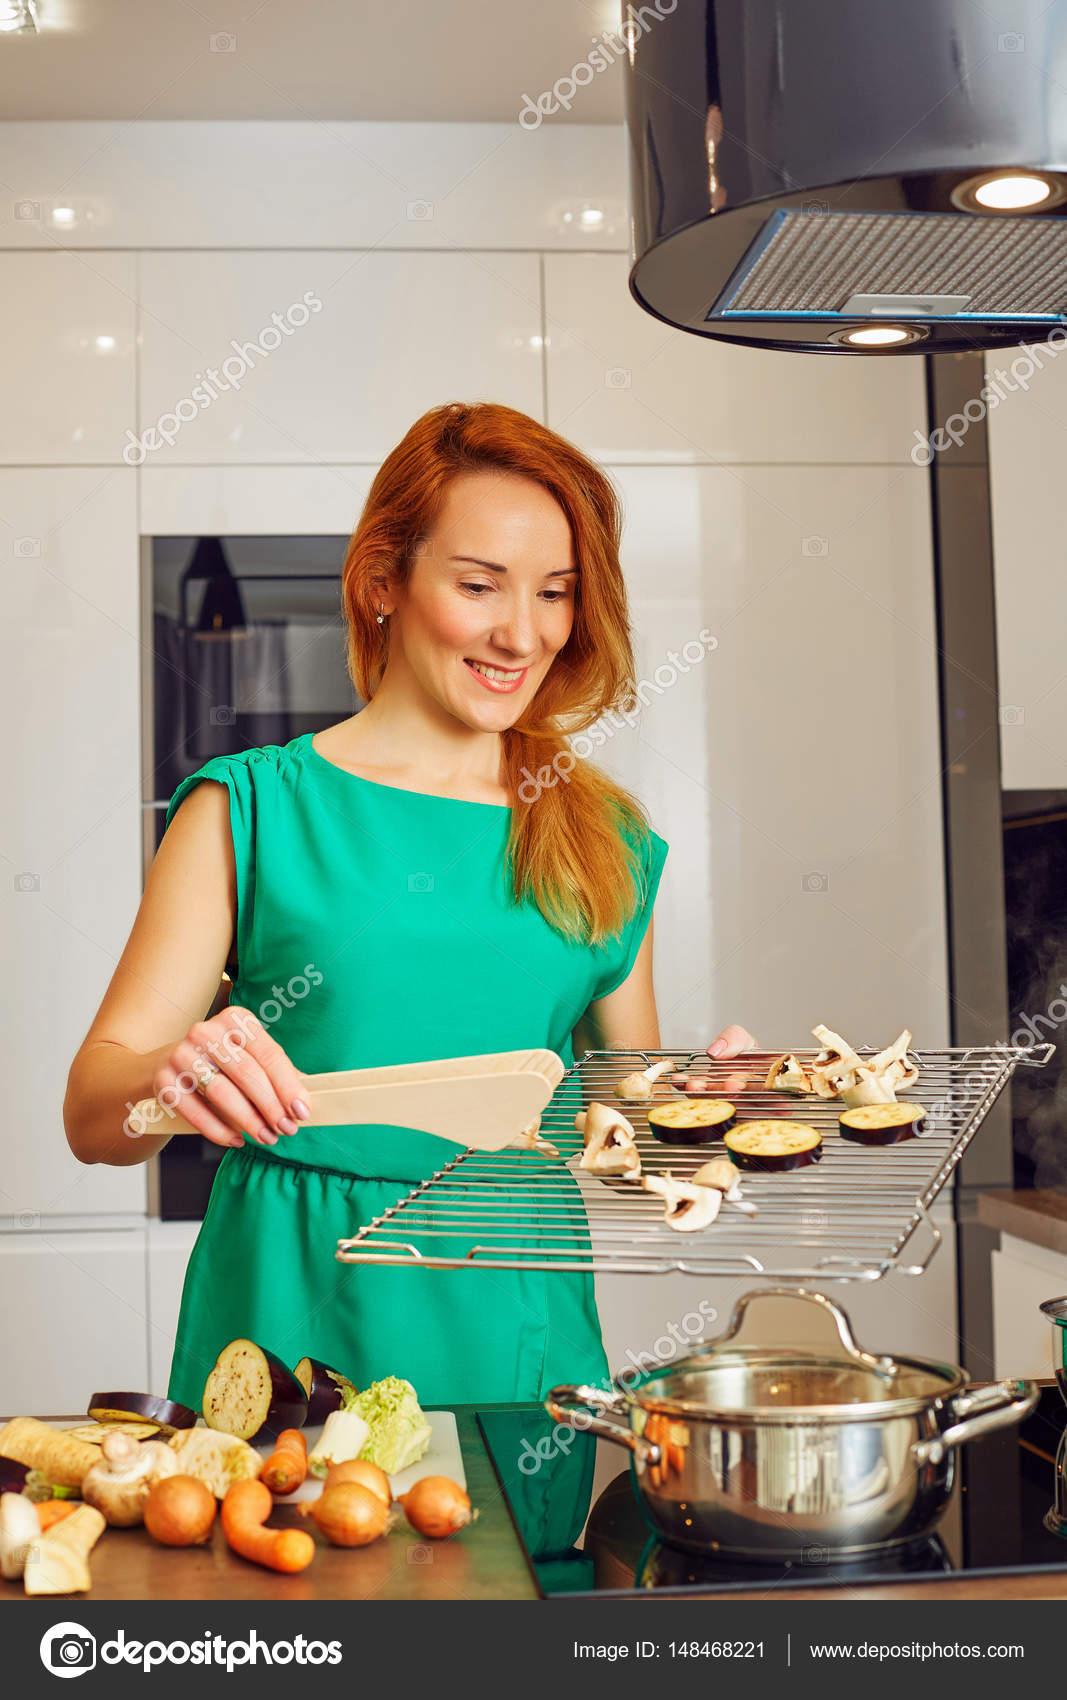 nice kitchen tables cherry island 漂亮微笑女人红头发站在厨房的桌子旁边和持有格栅与蔬菜 在高科技现代 漂亮微笑女人红头发站在厨房的桌子旁边和持有格栅